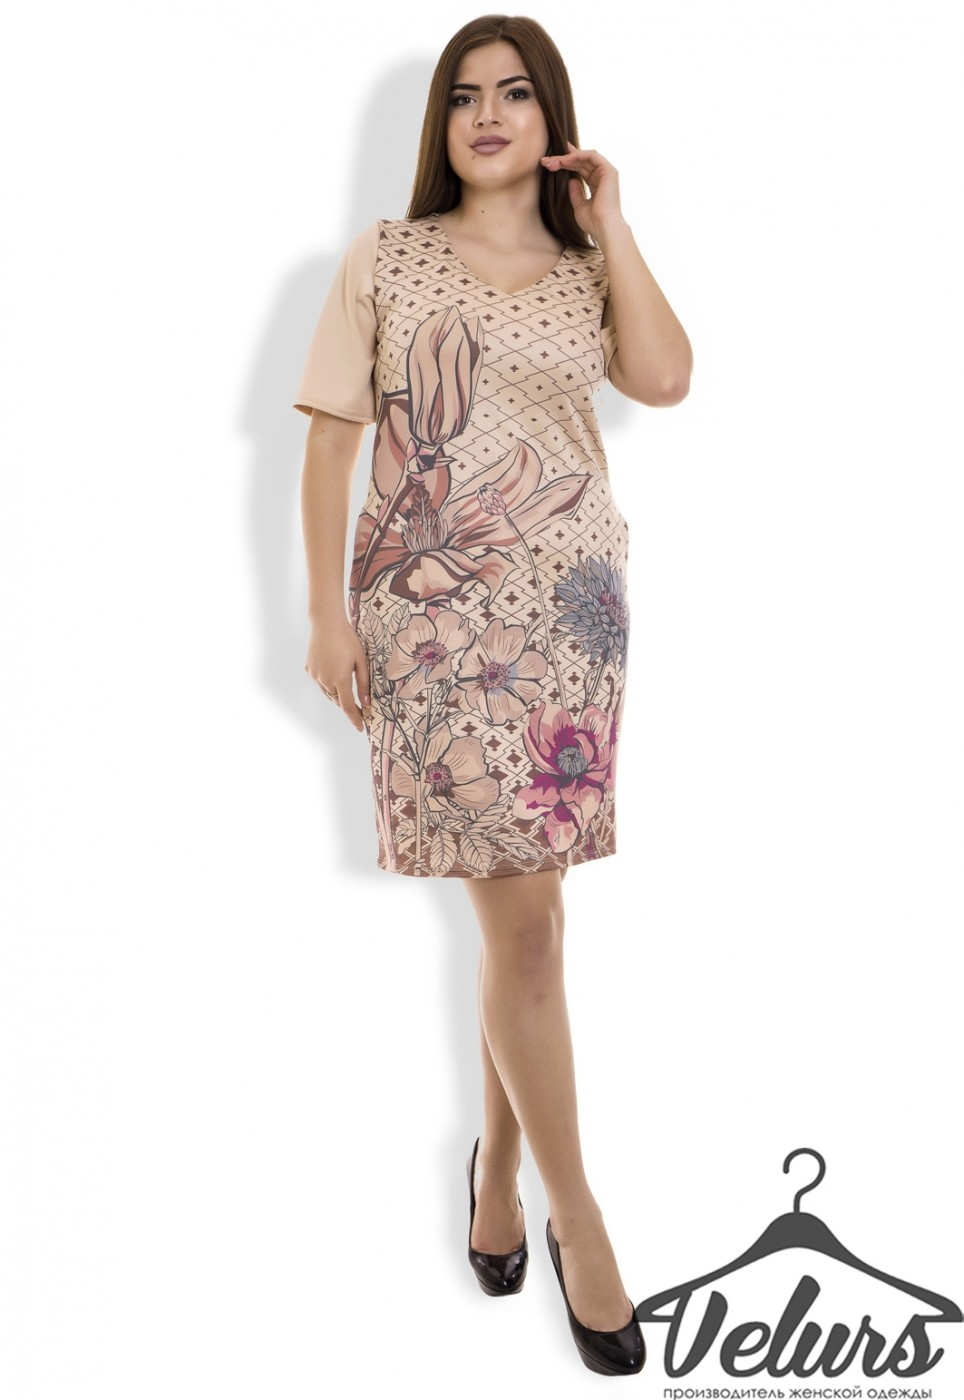 Velurs: Платье 212110 - фото 13